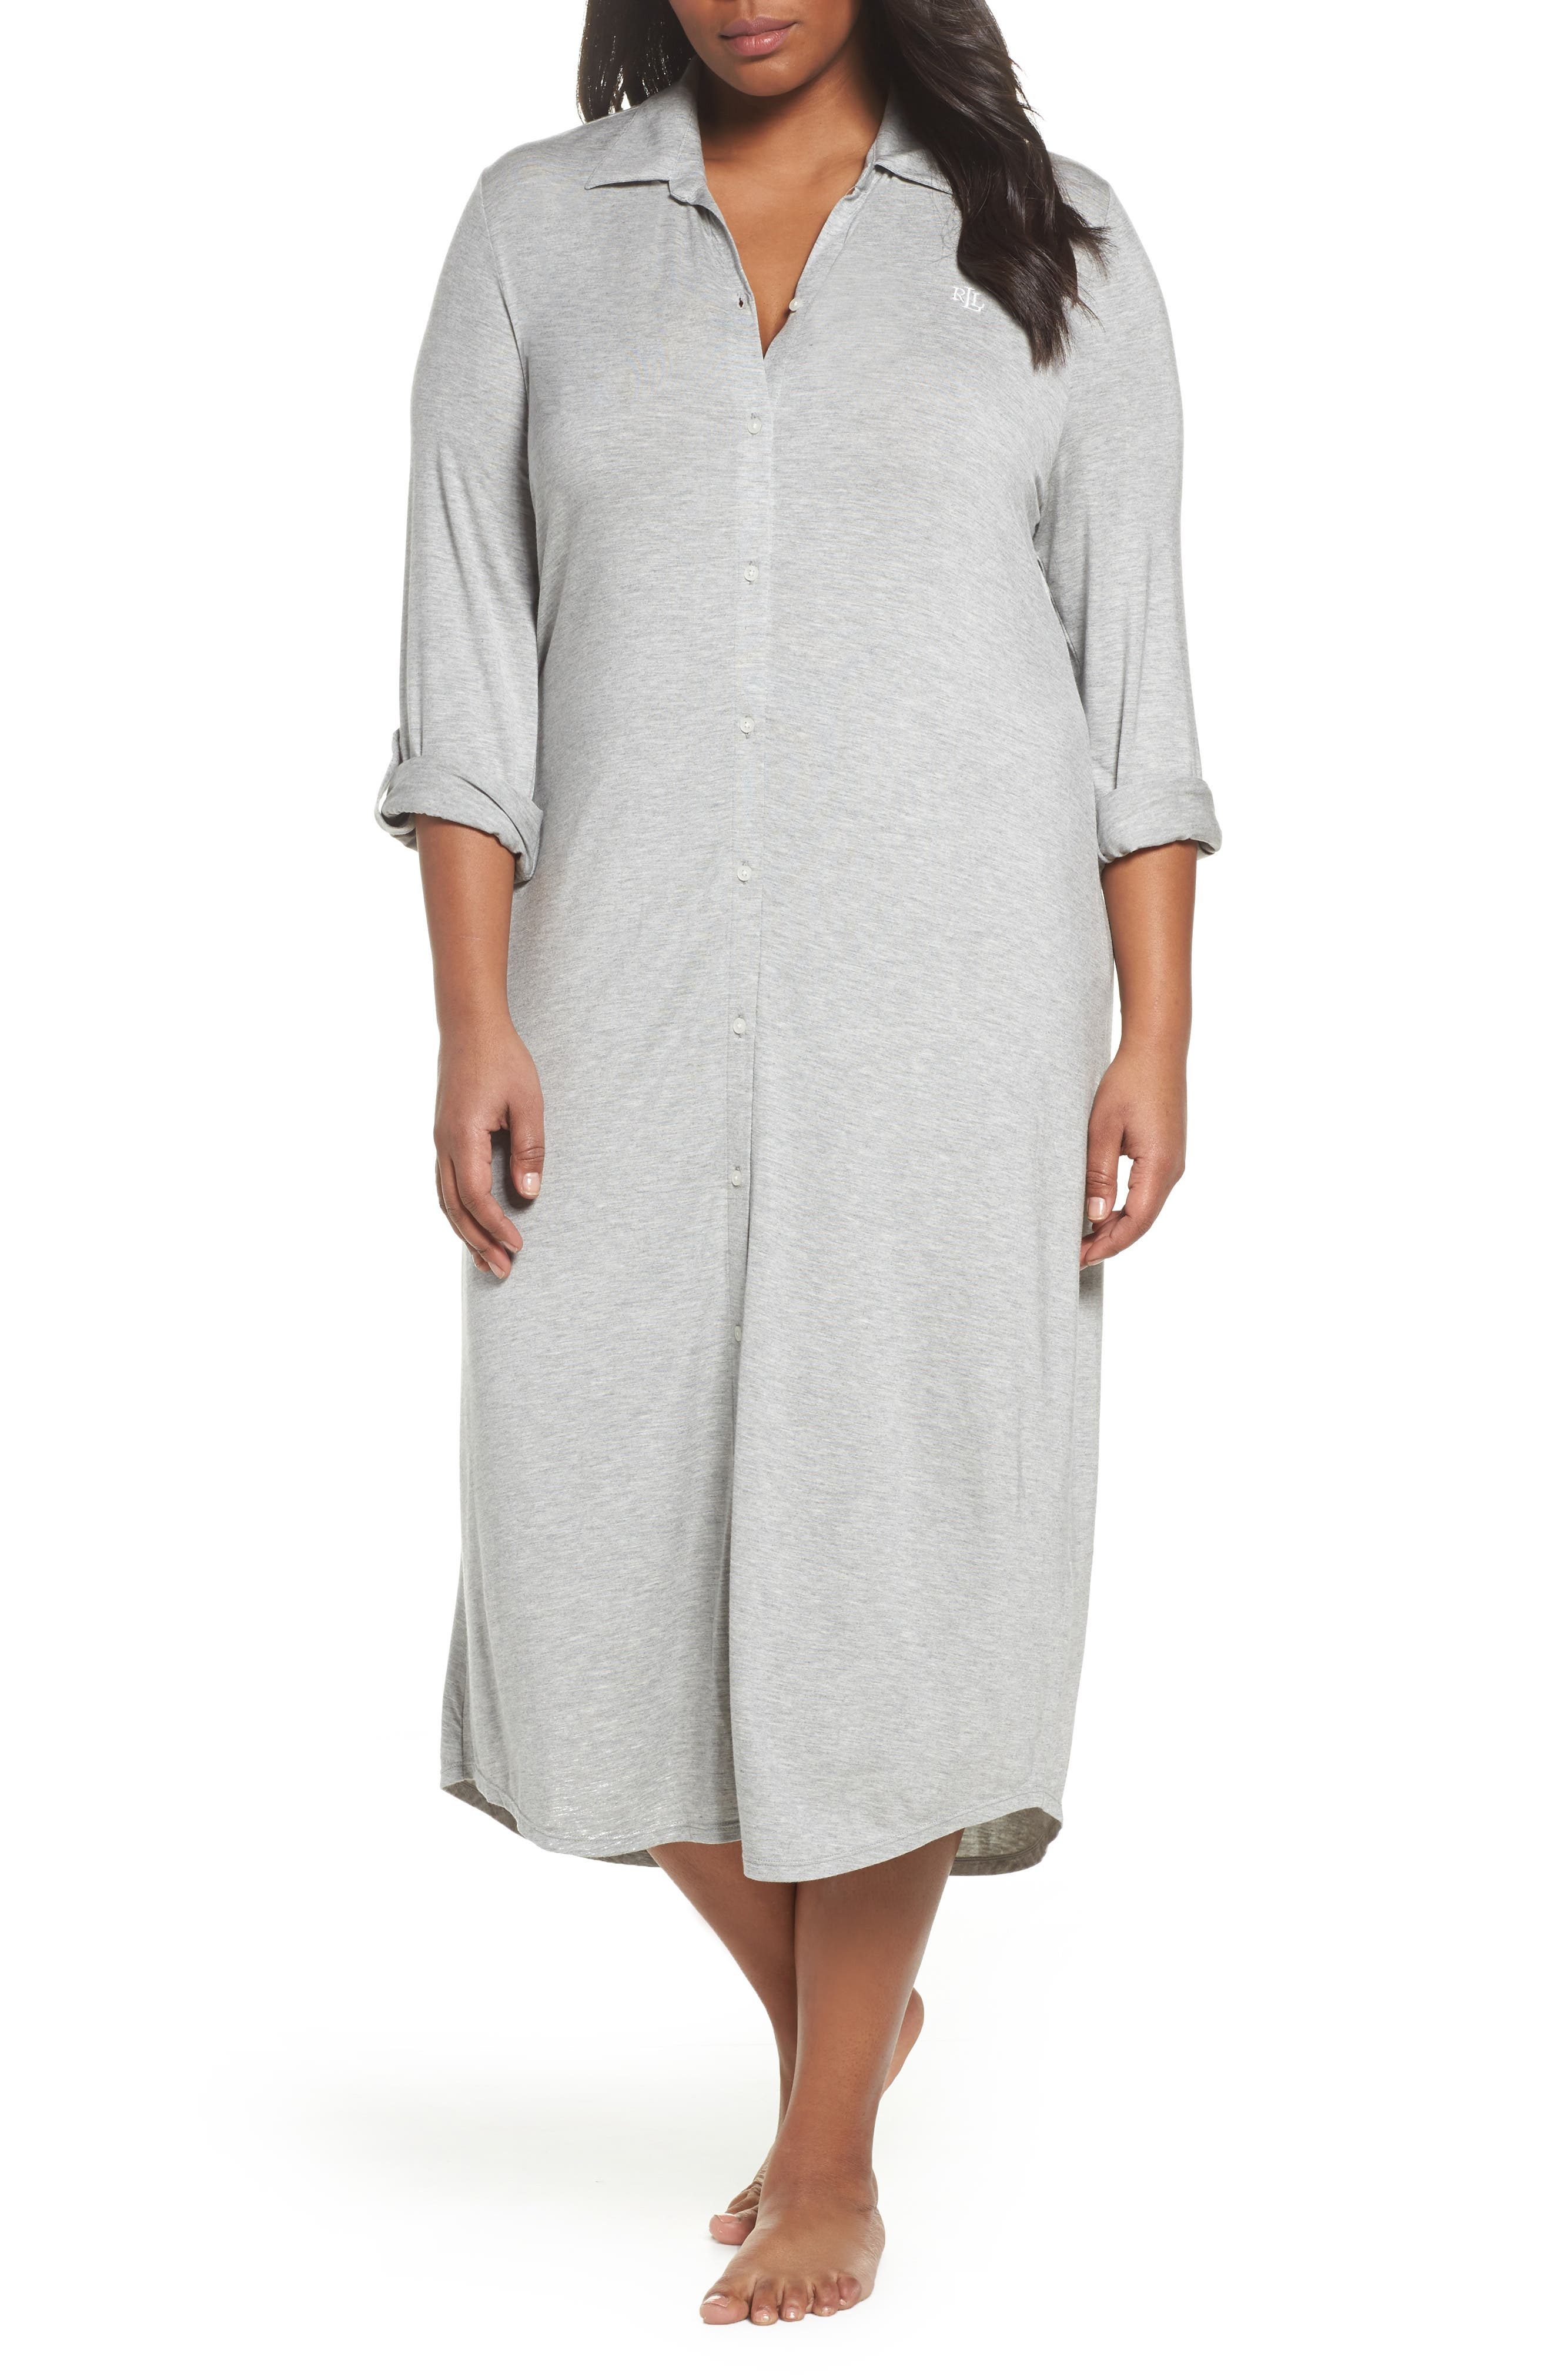 Long Night Shirt,                             Main thumbnail 1, color,                             Heather Grey Feeder Stripe